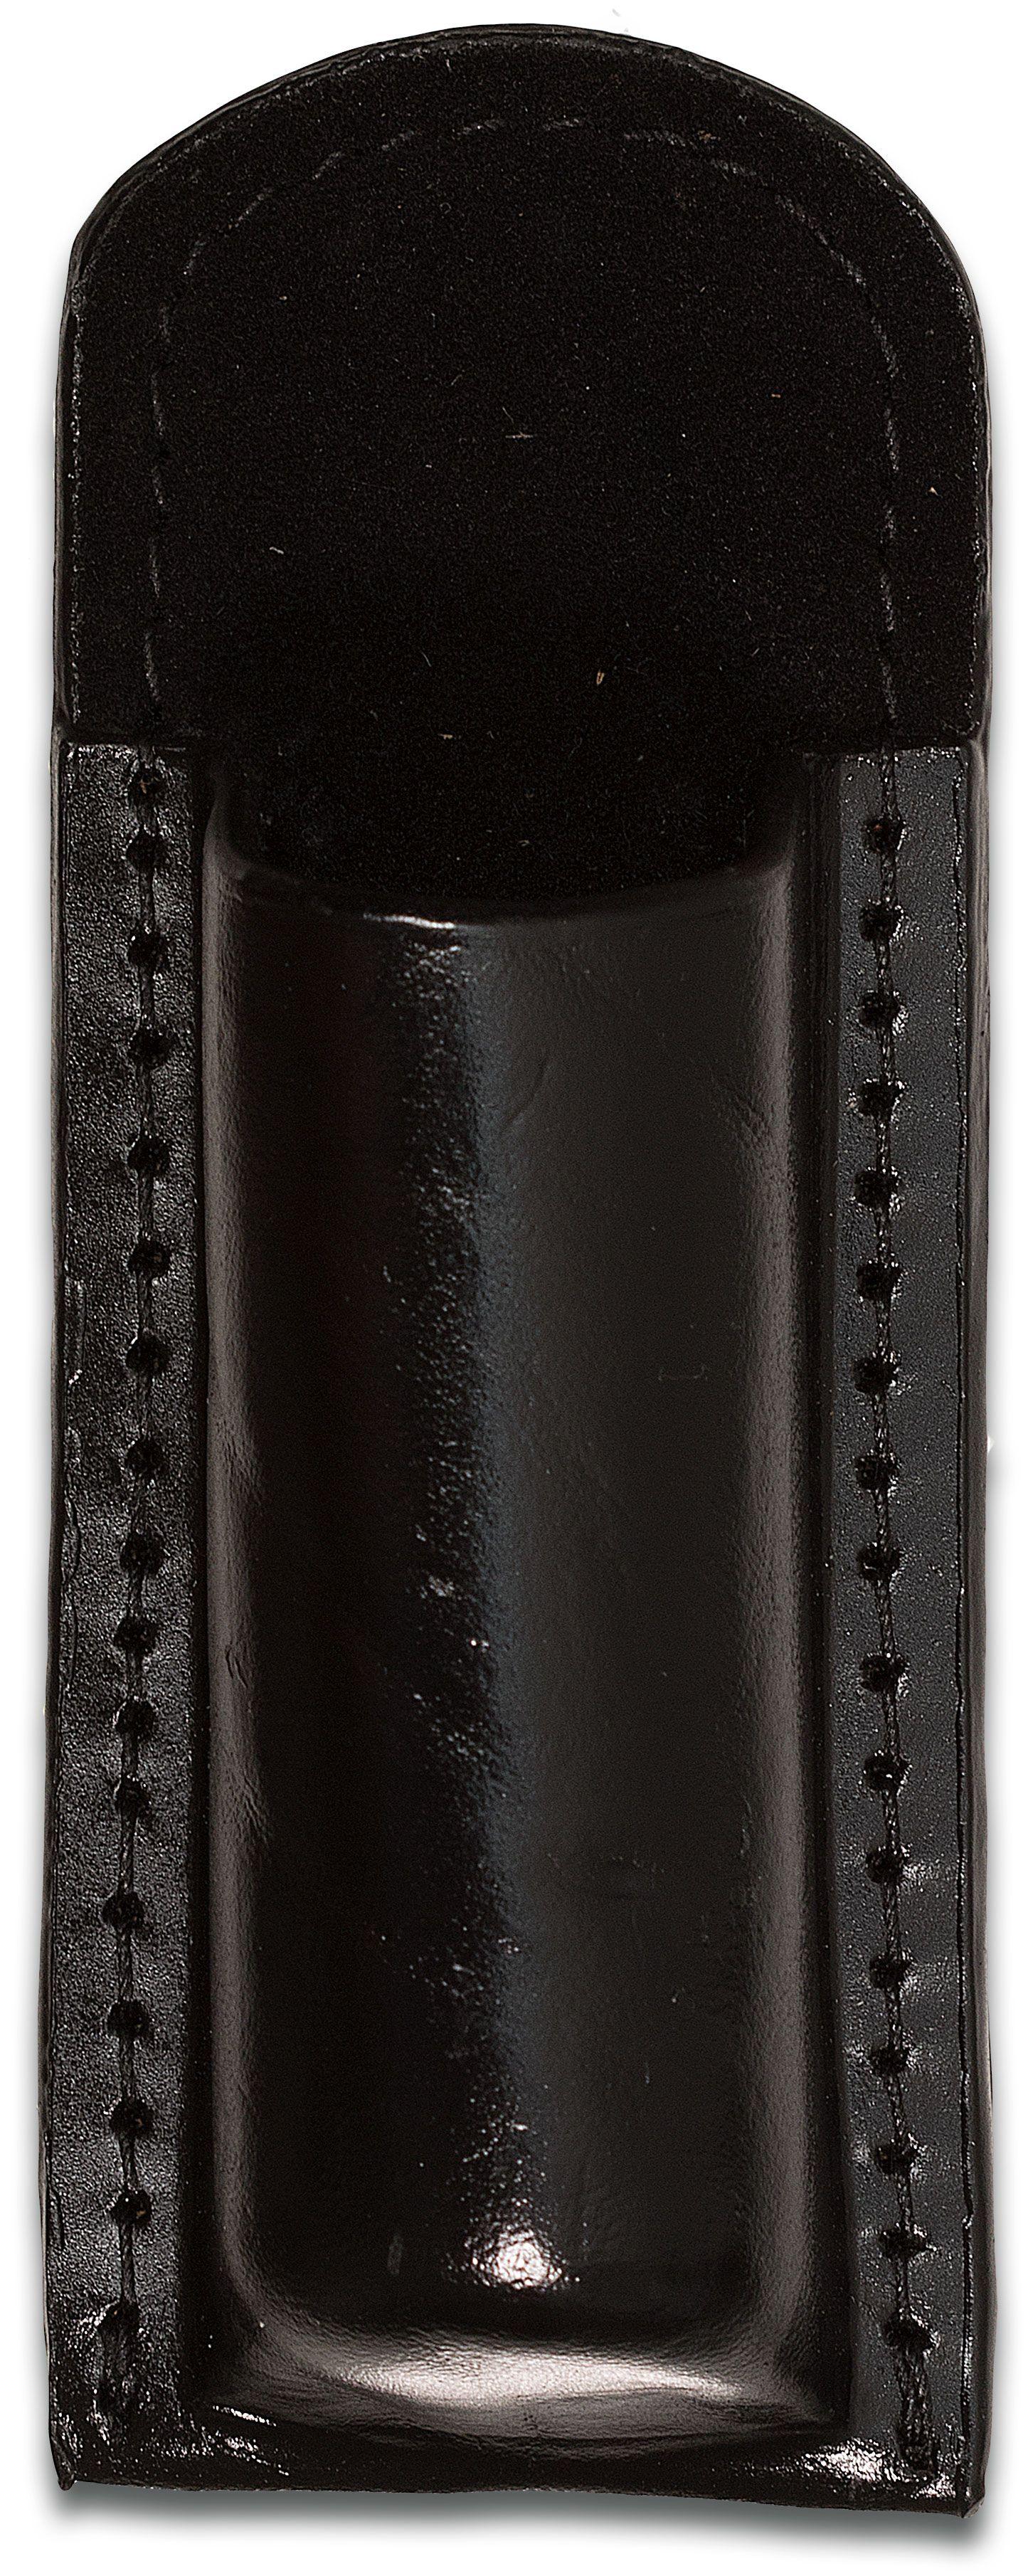 ASP F16 Duty Black Rotating Scabbard Fits 16 inch Friction Loc F16 Baton